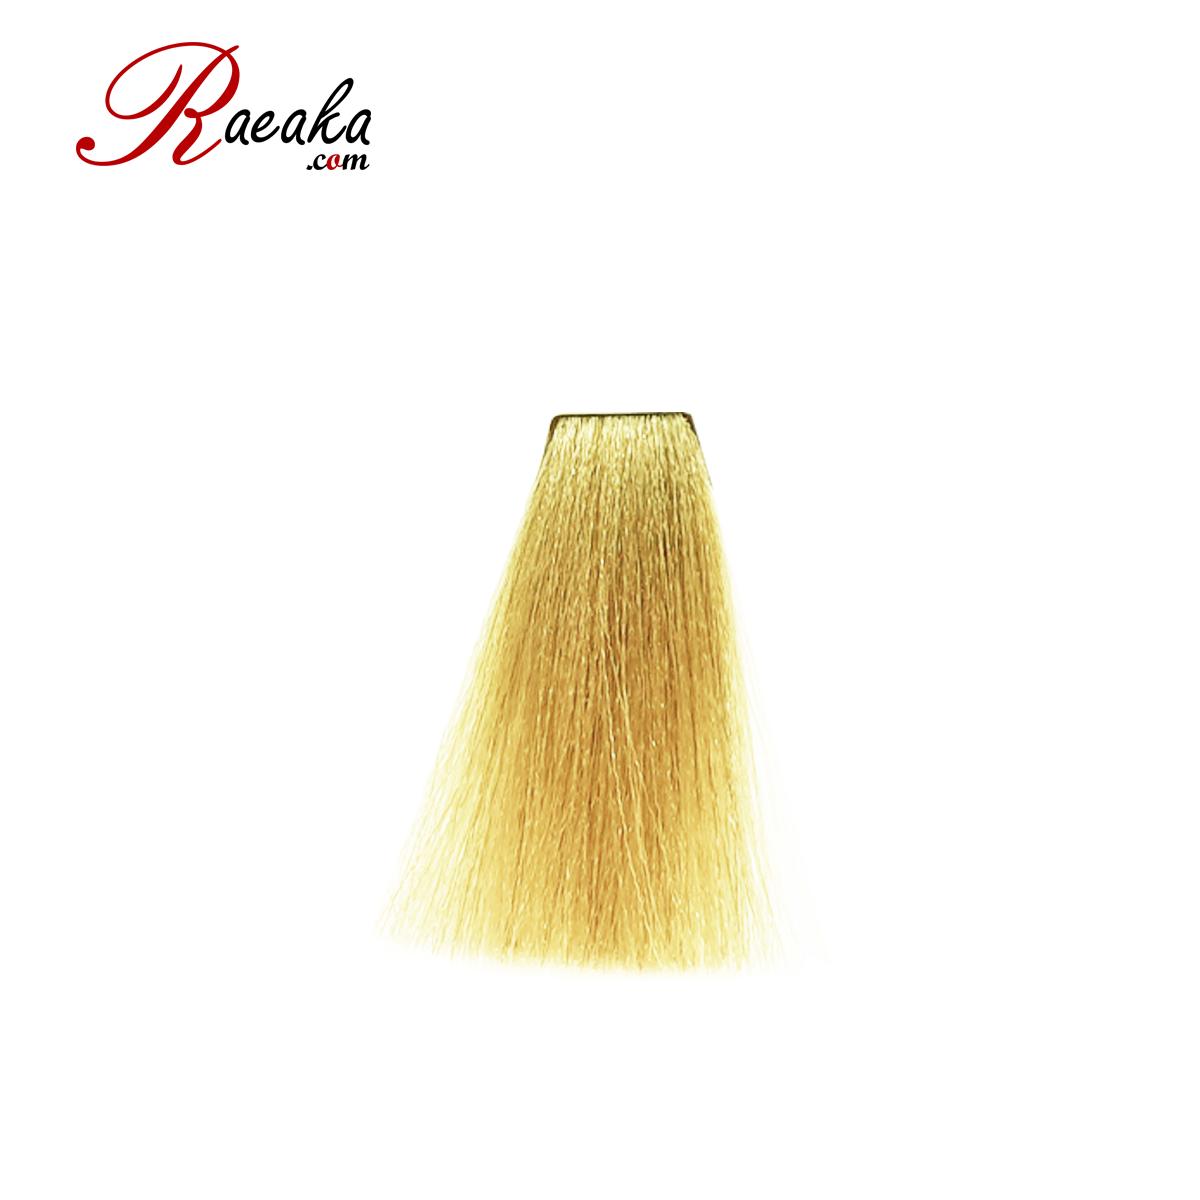 رنگ مو دوماسی سری طبیعی اکسترا بلوند پلاتینه خیلی خیلی روشن اکسترا ۱۲٫۰۰ حجم ۱۲۰ میلی لیتر